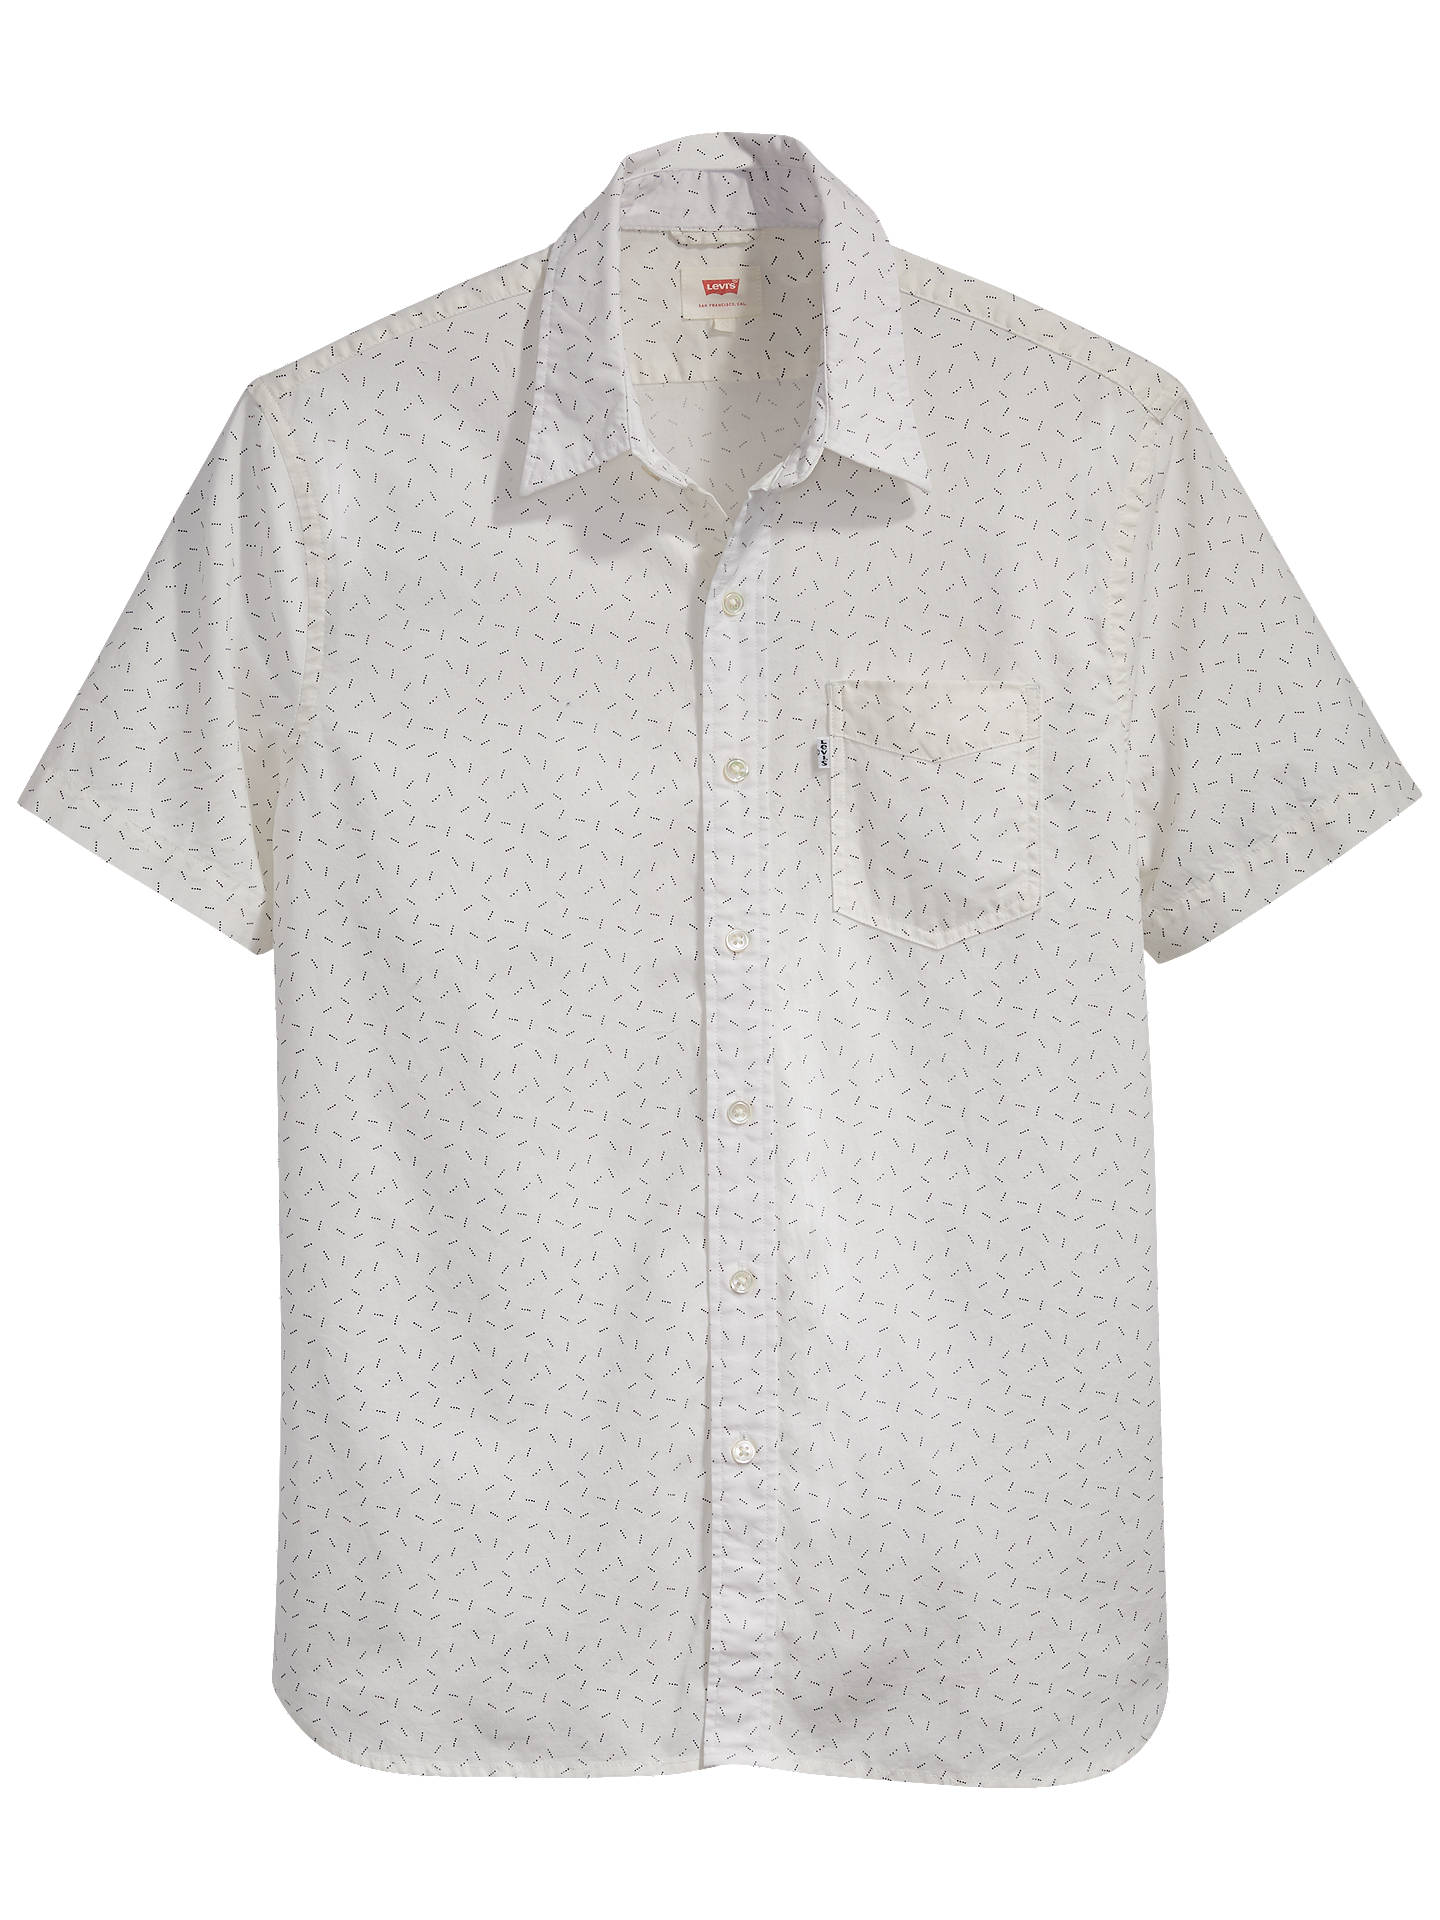 0c76e40de ... Buy Levi's Sunset One Pocket Short Sleeve Shirt, Cowbird  Marshmallow/Grey, S Online